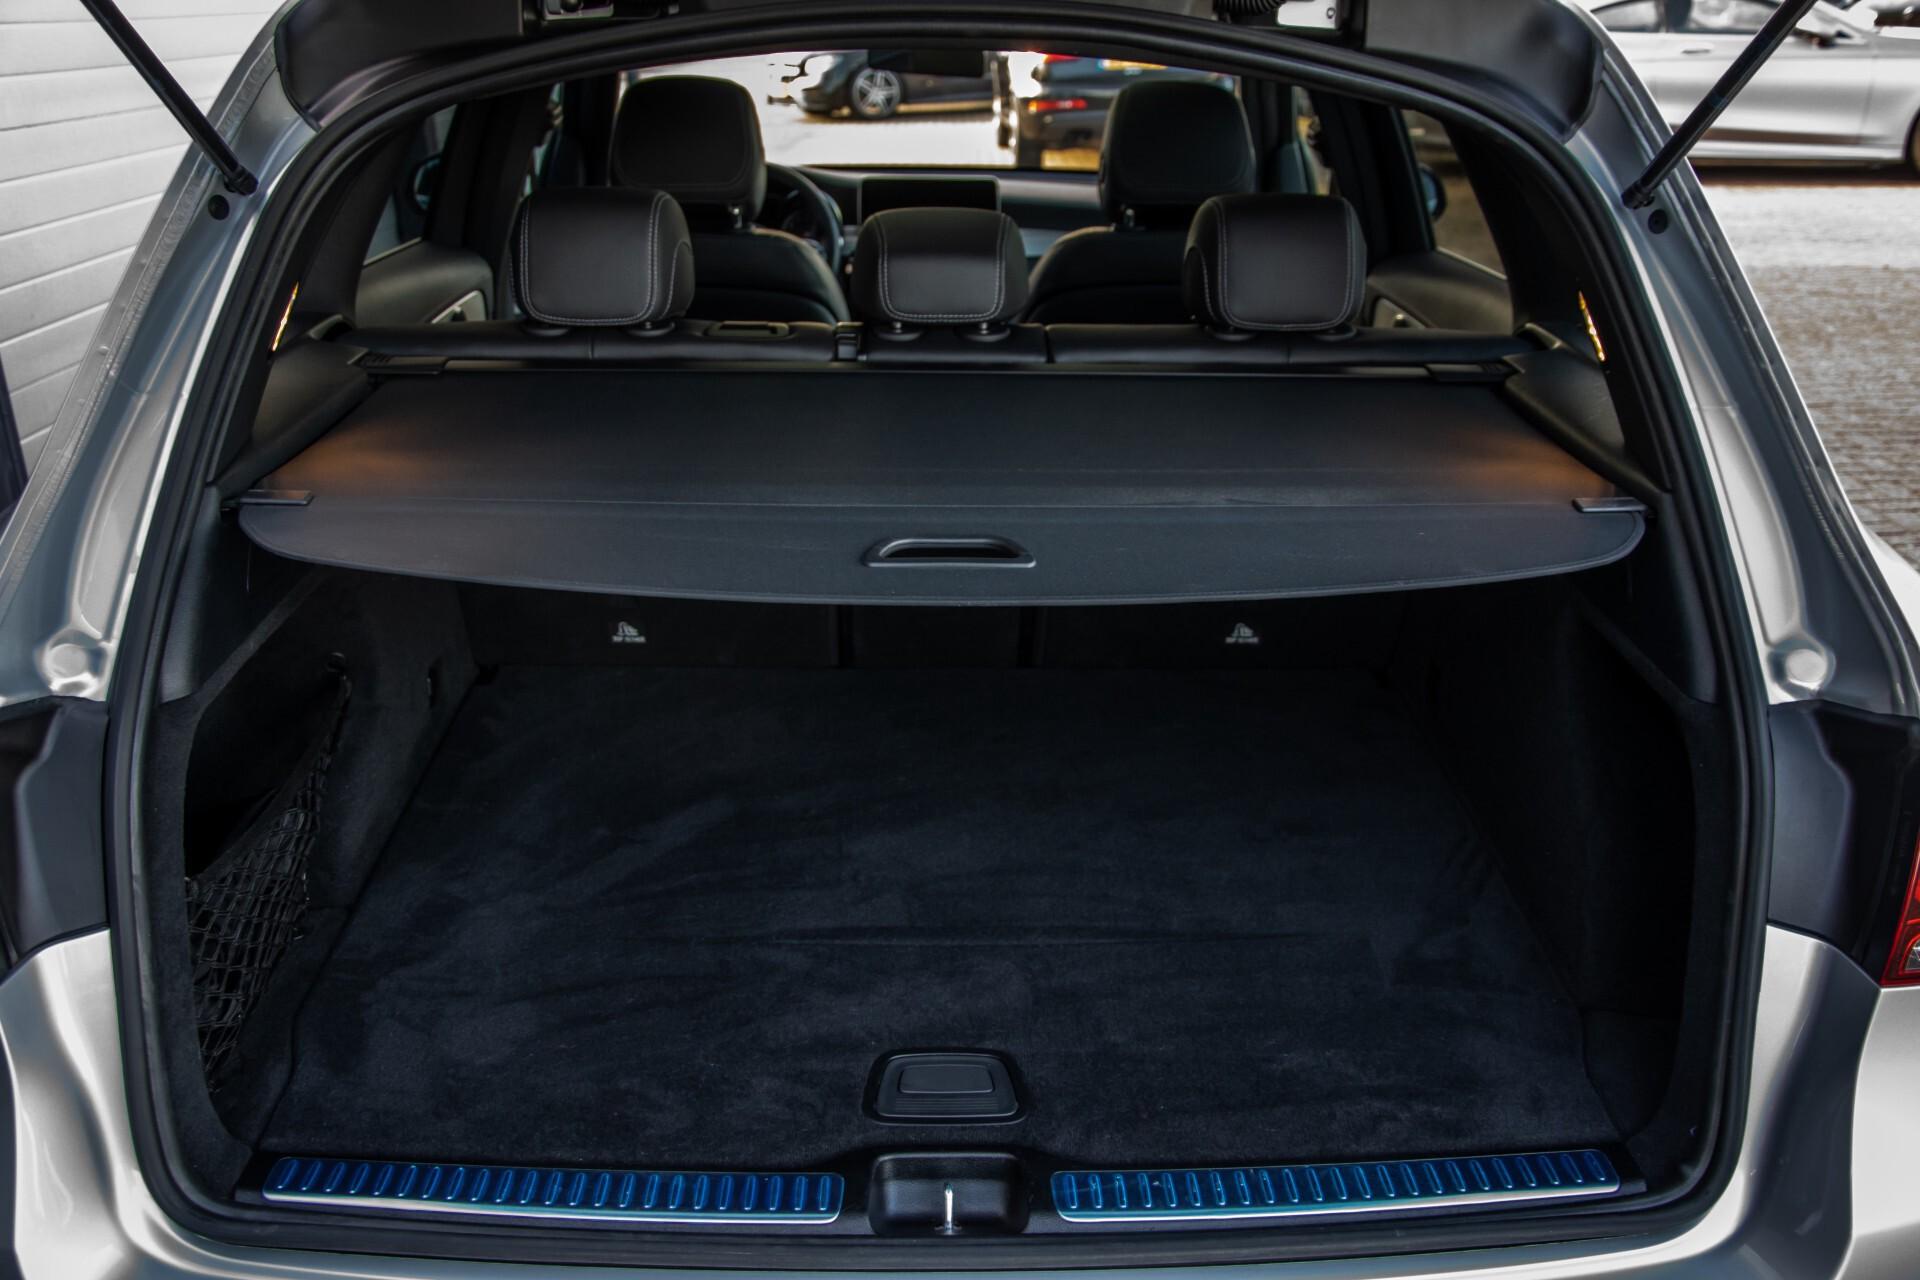 Mercedes-Benz GLC 300 4-M AMG Panorama/Keyless/Assistentiepakket/MBUX//Wegkl-trekhaak Aut9 Foto 51